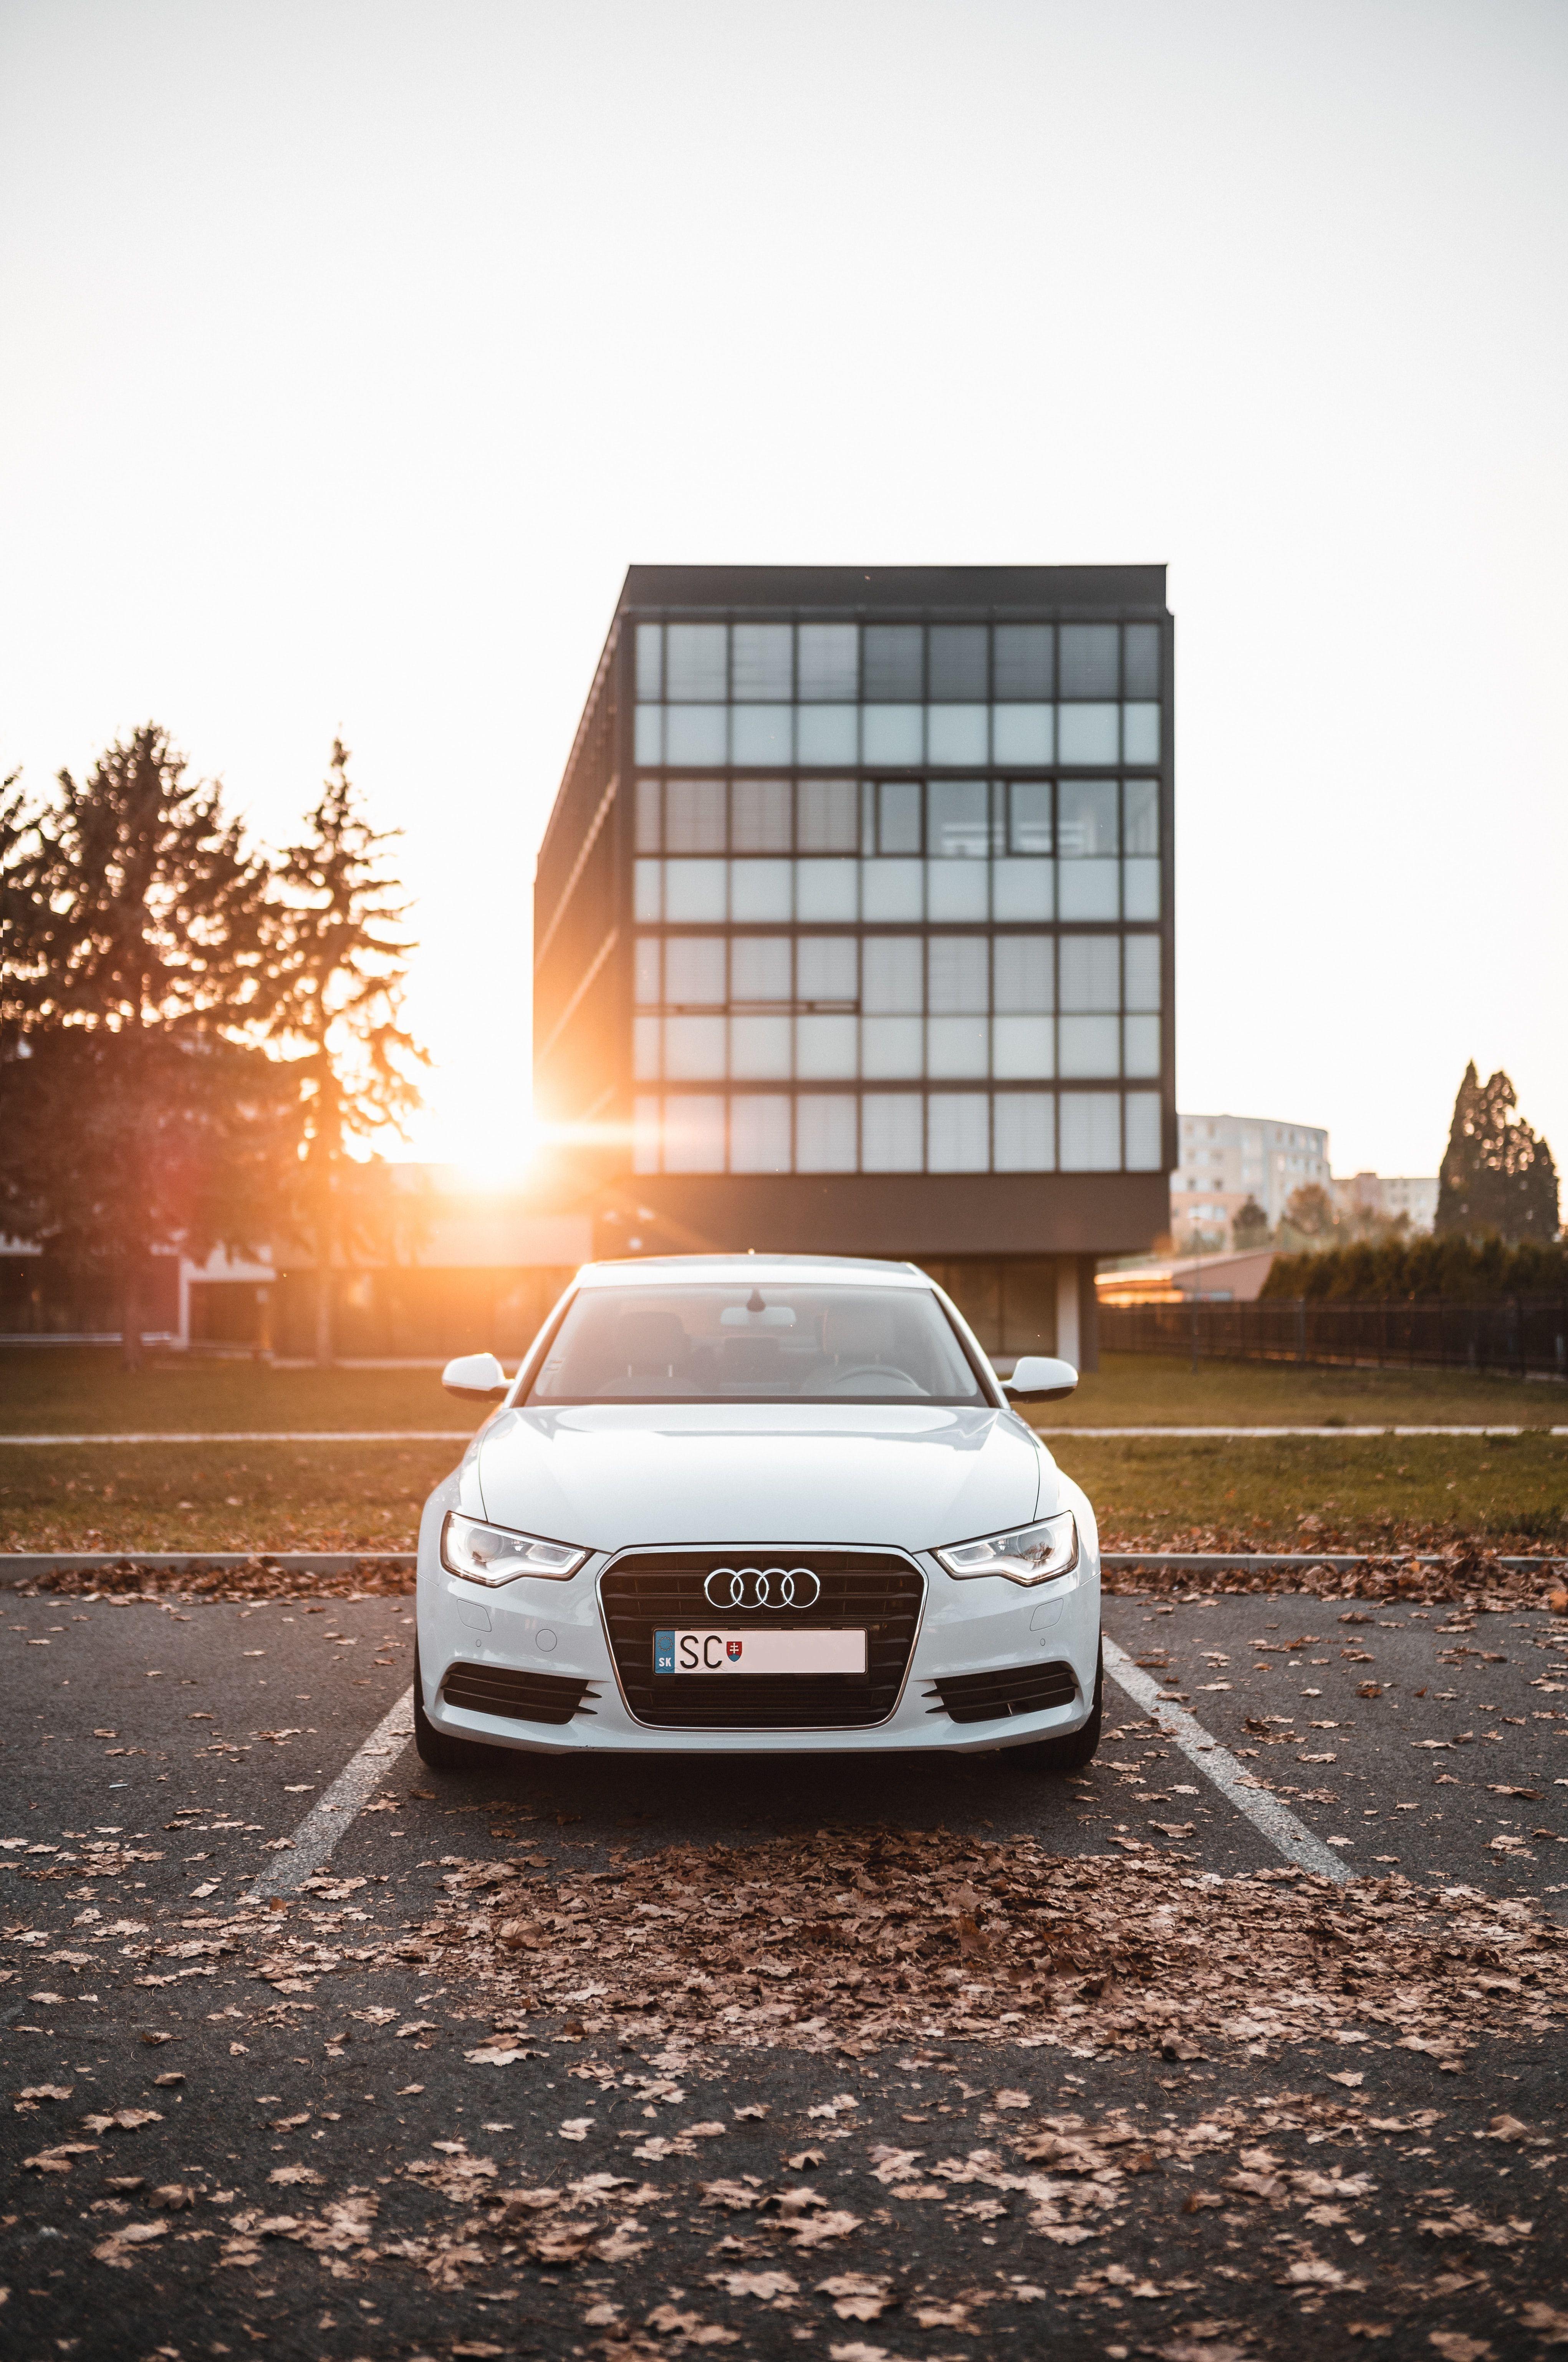 White Audi Sedan On Parked Cars In 2020 With Images Audi Sedan Audi Sedan